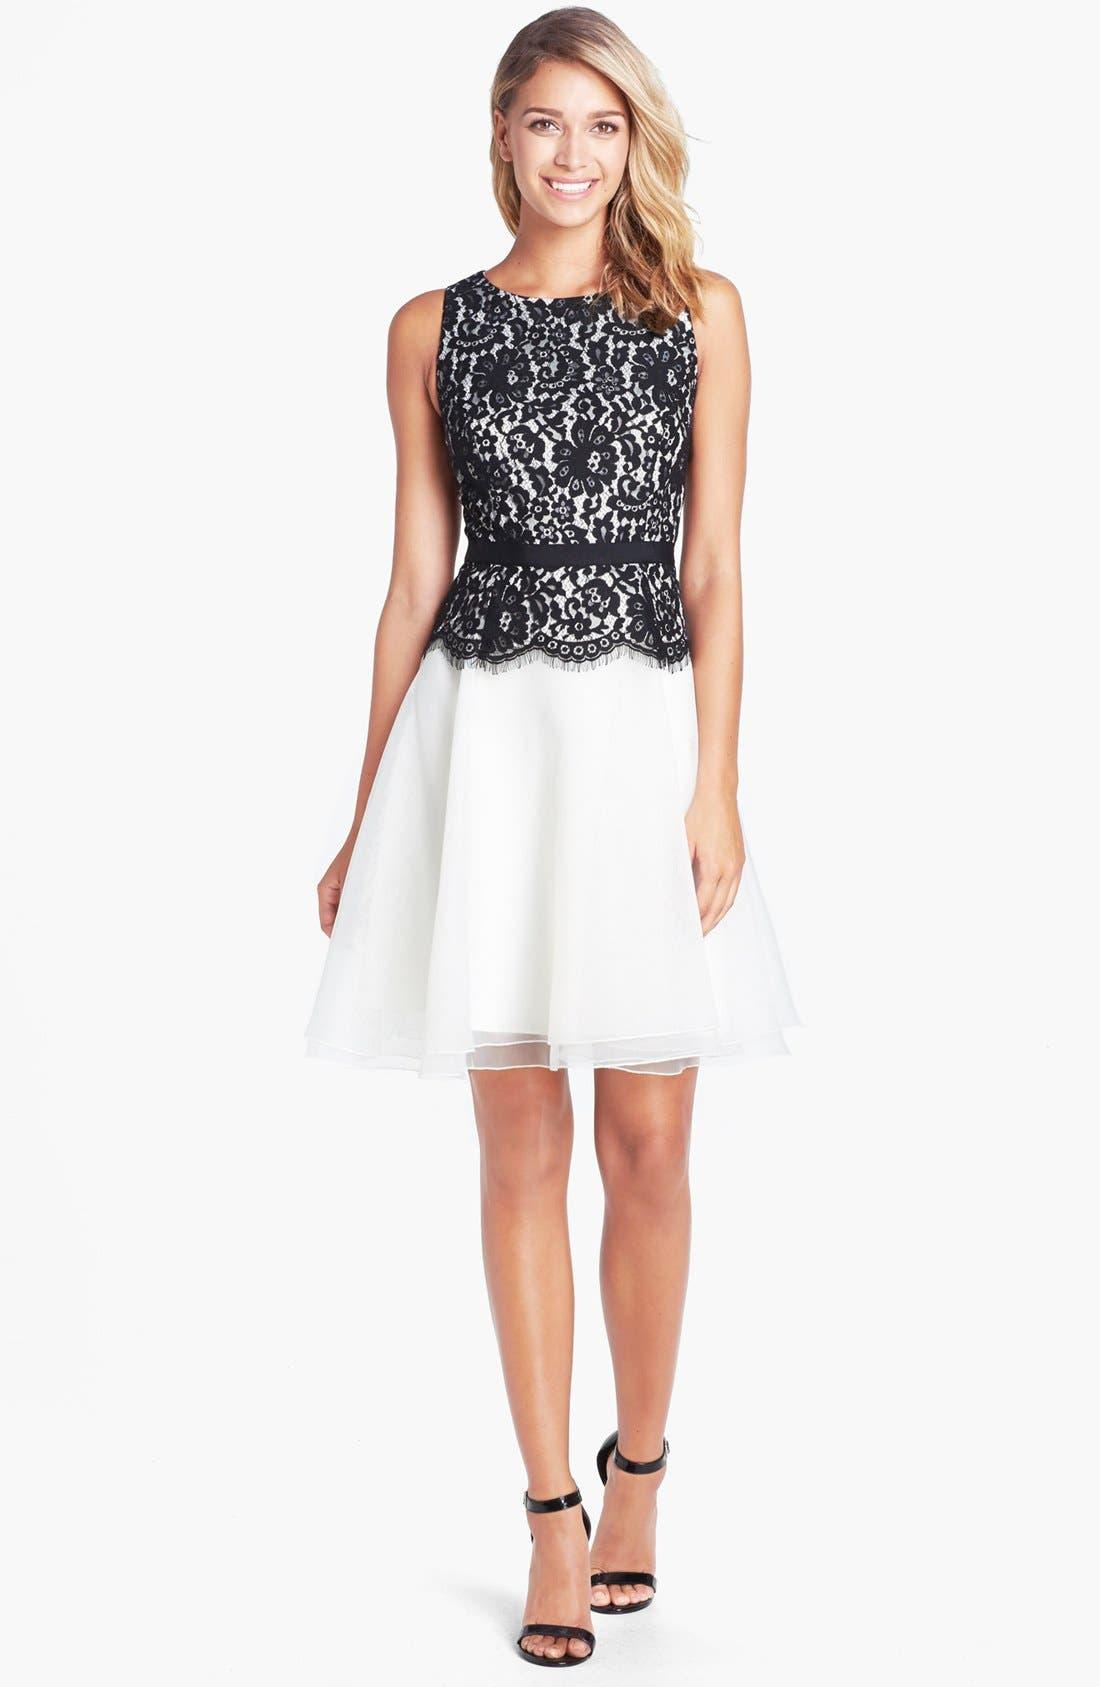 Alternate Image 1 Selected - Eliza J Lace Bodice Fit & Flare Dress (Petite)